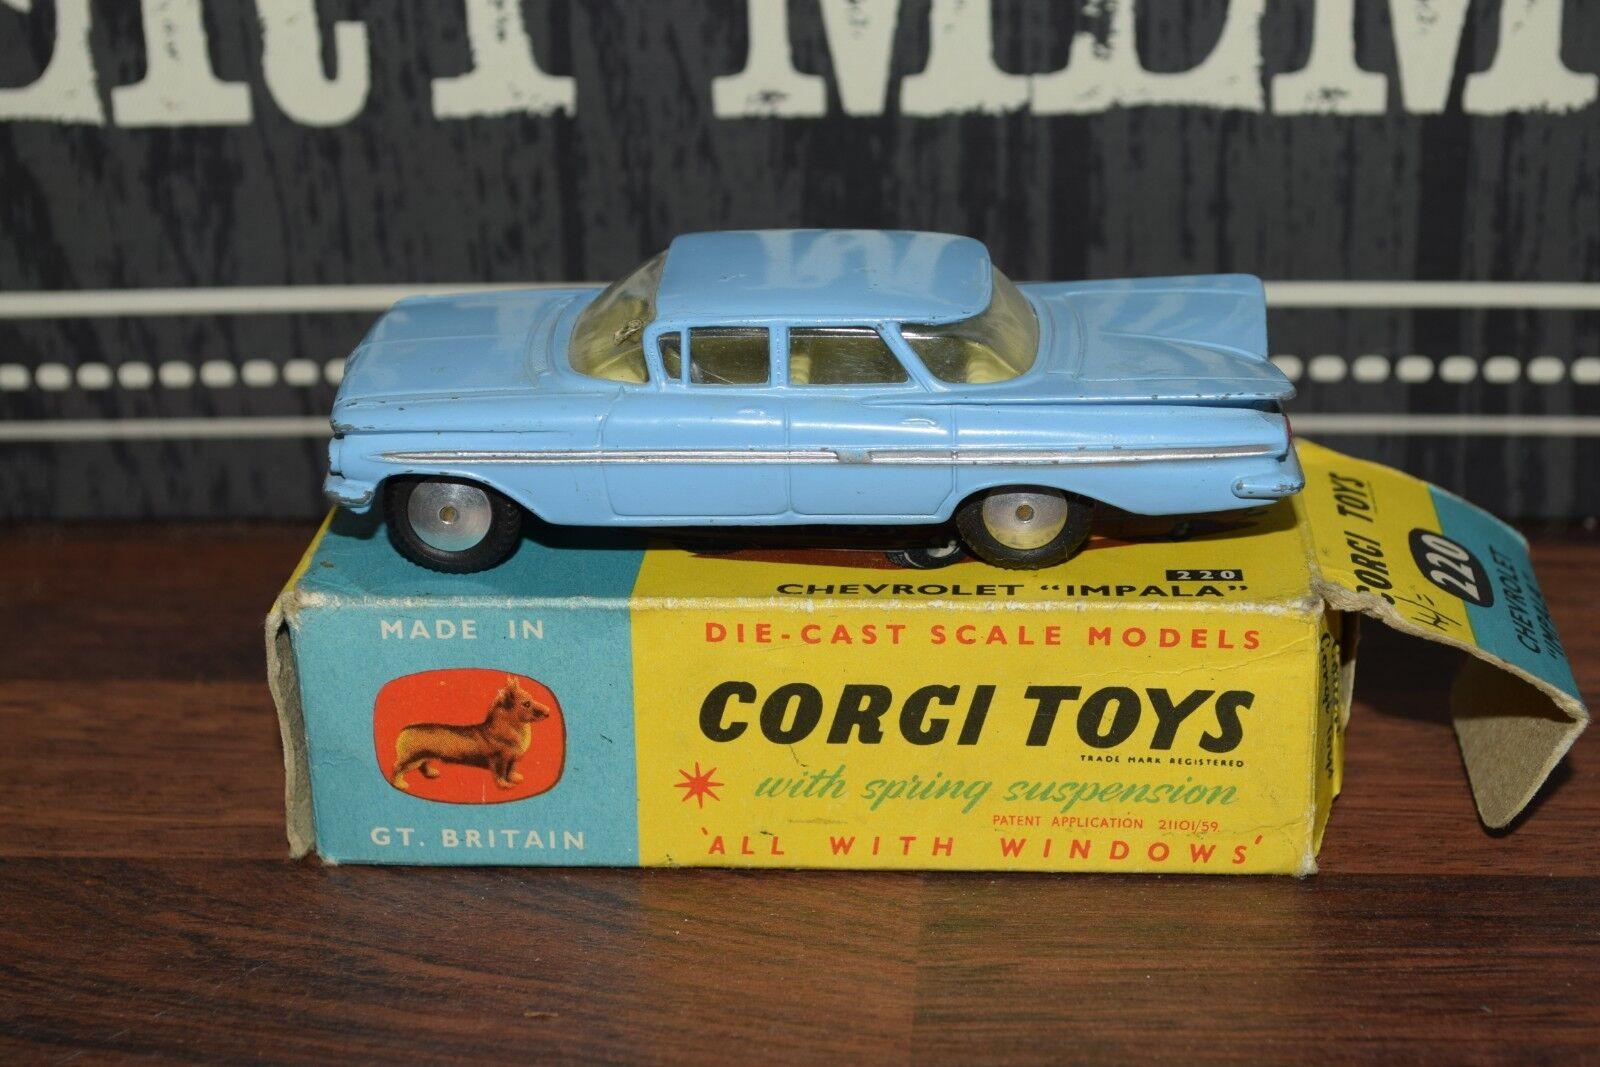 Corgi 220 Chevrolet Impala blå låda - Ex årgång Original tärningskast Old RARE USA